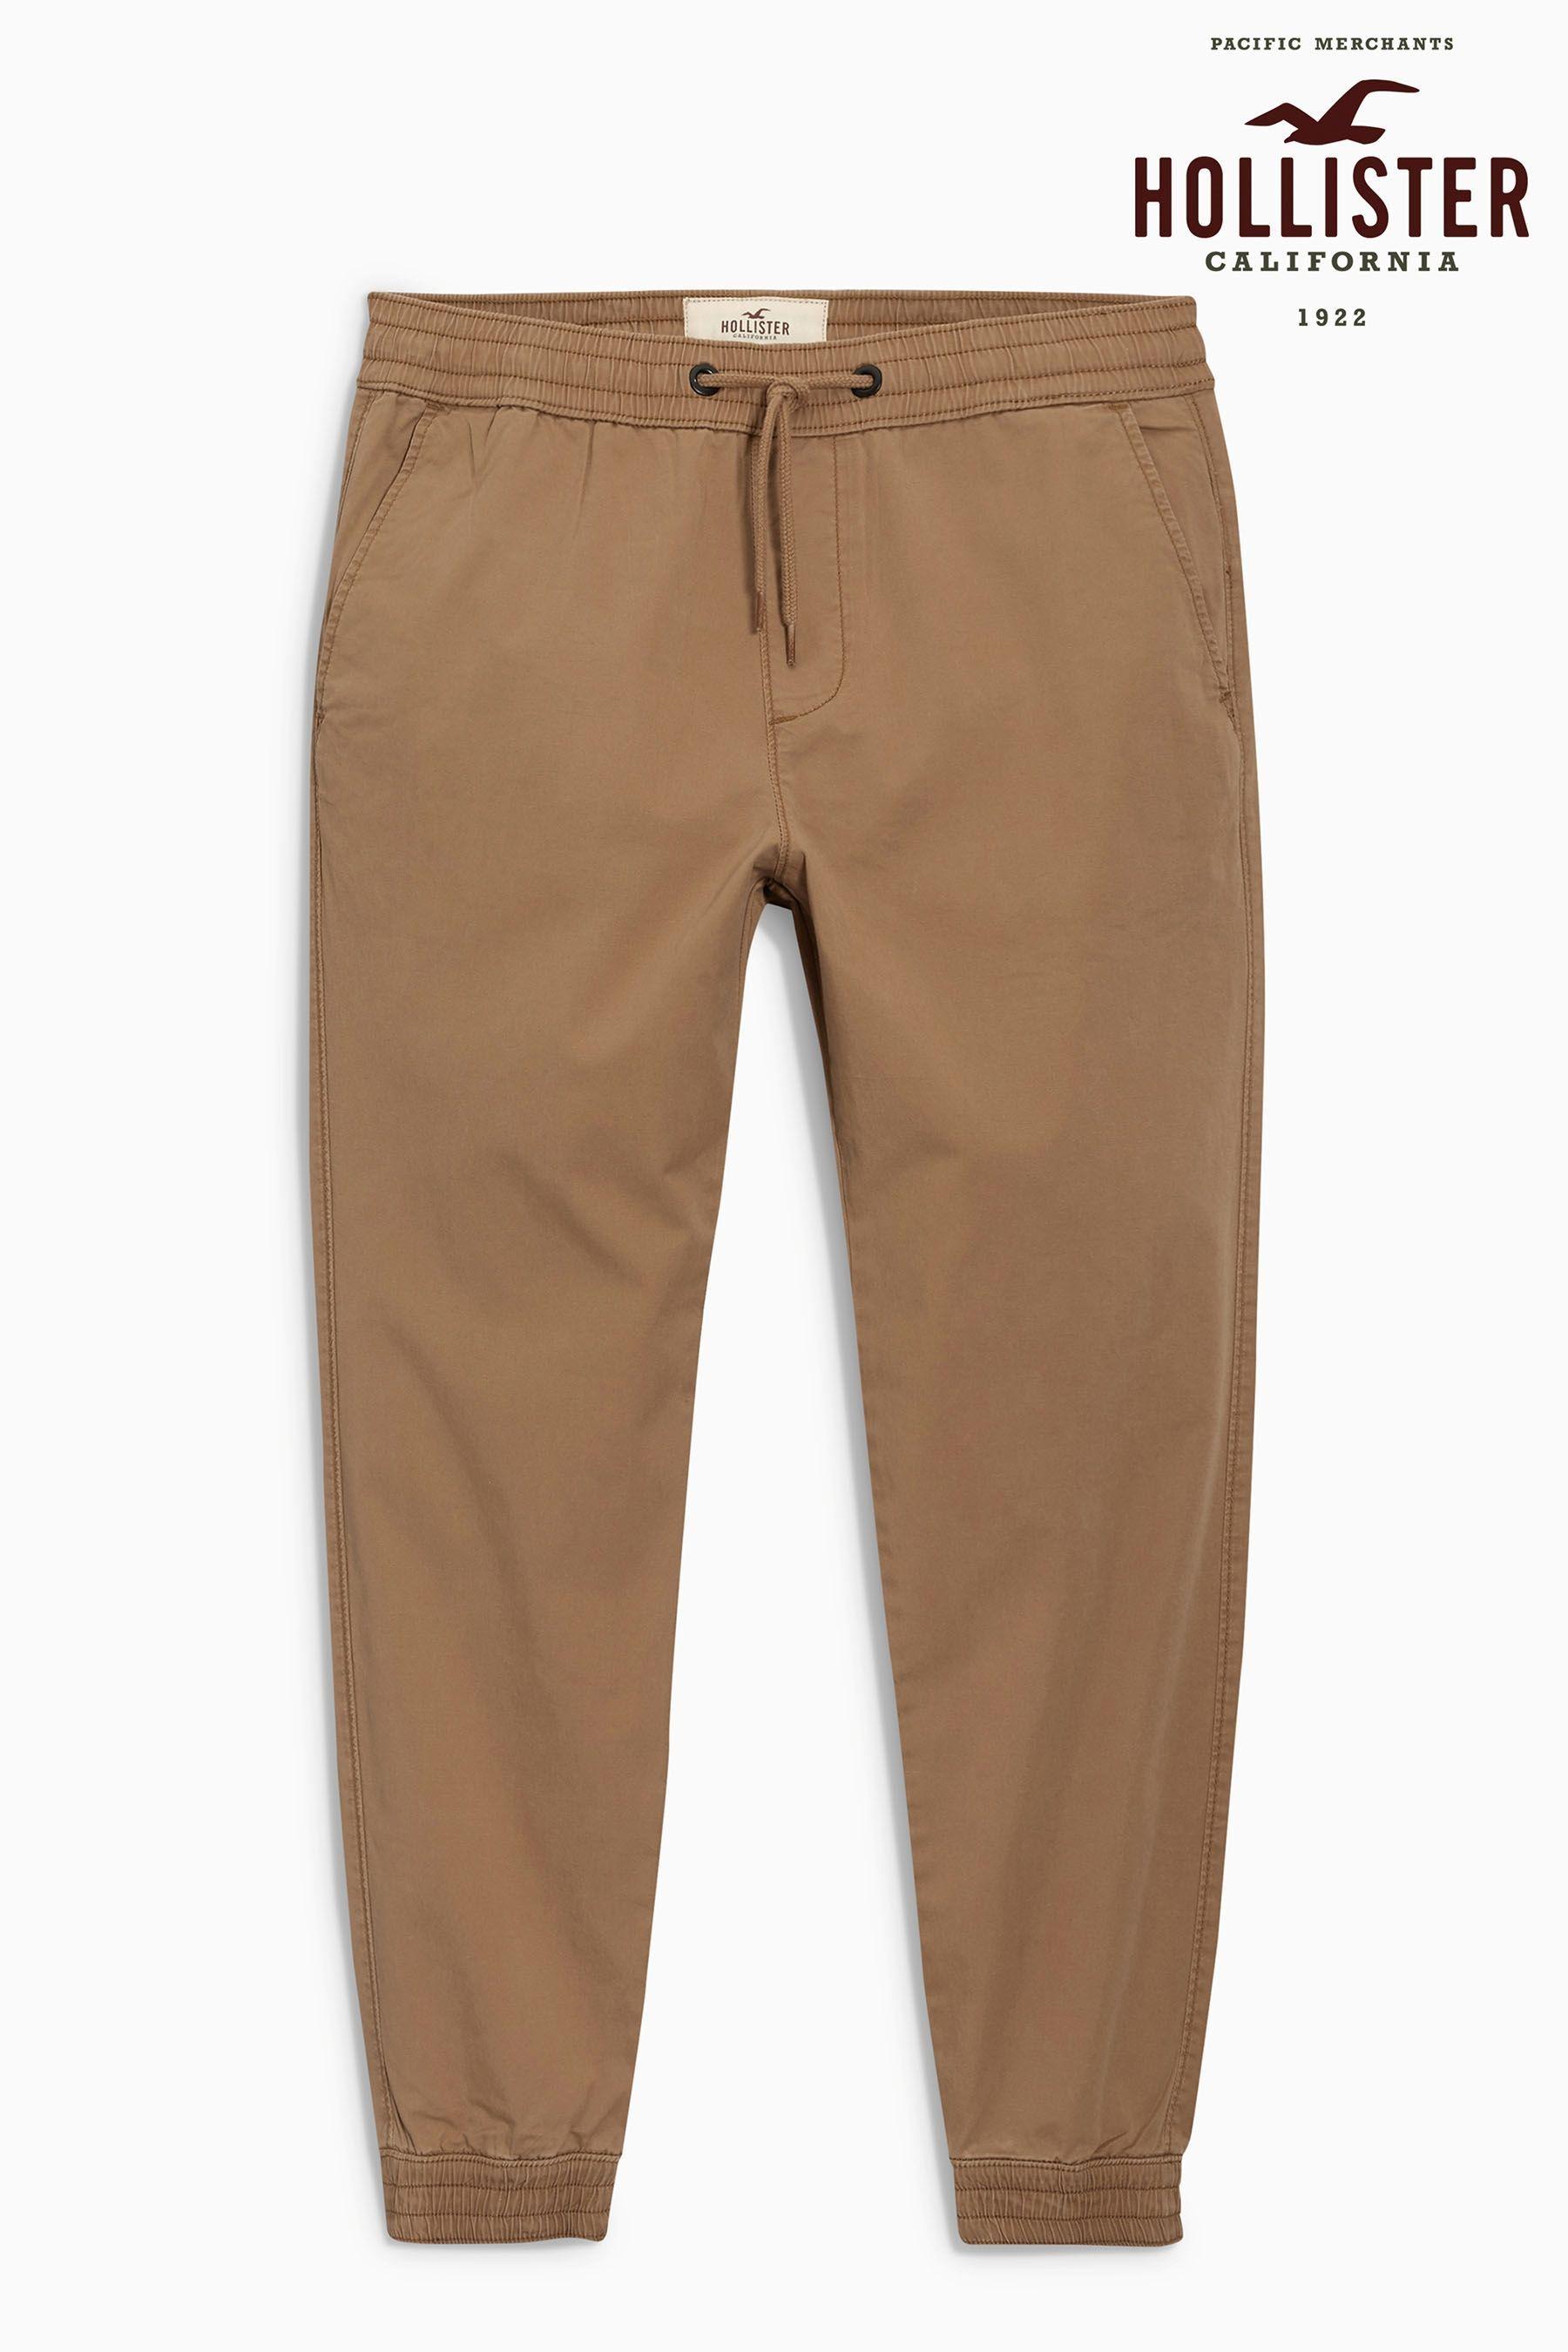 buy hollister jeans online